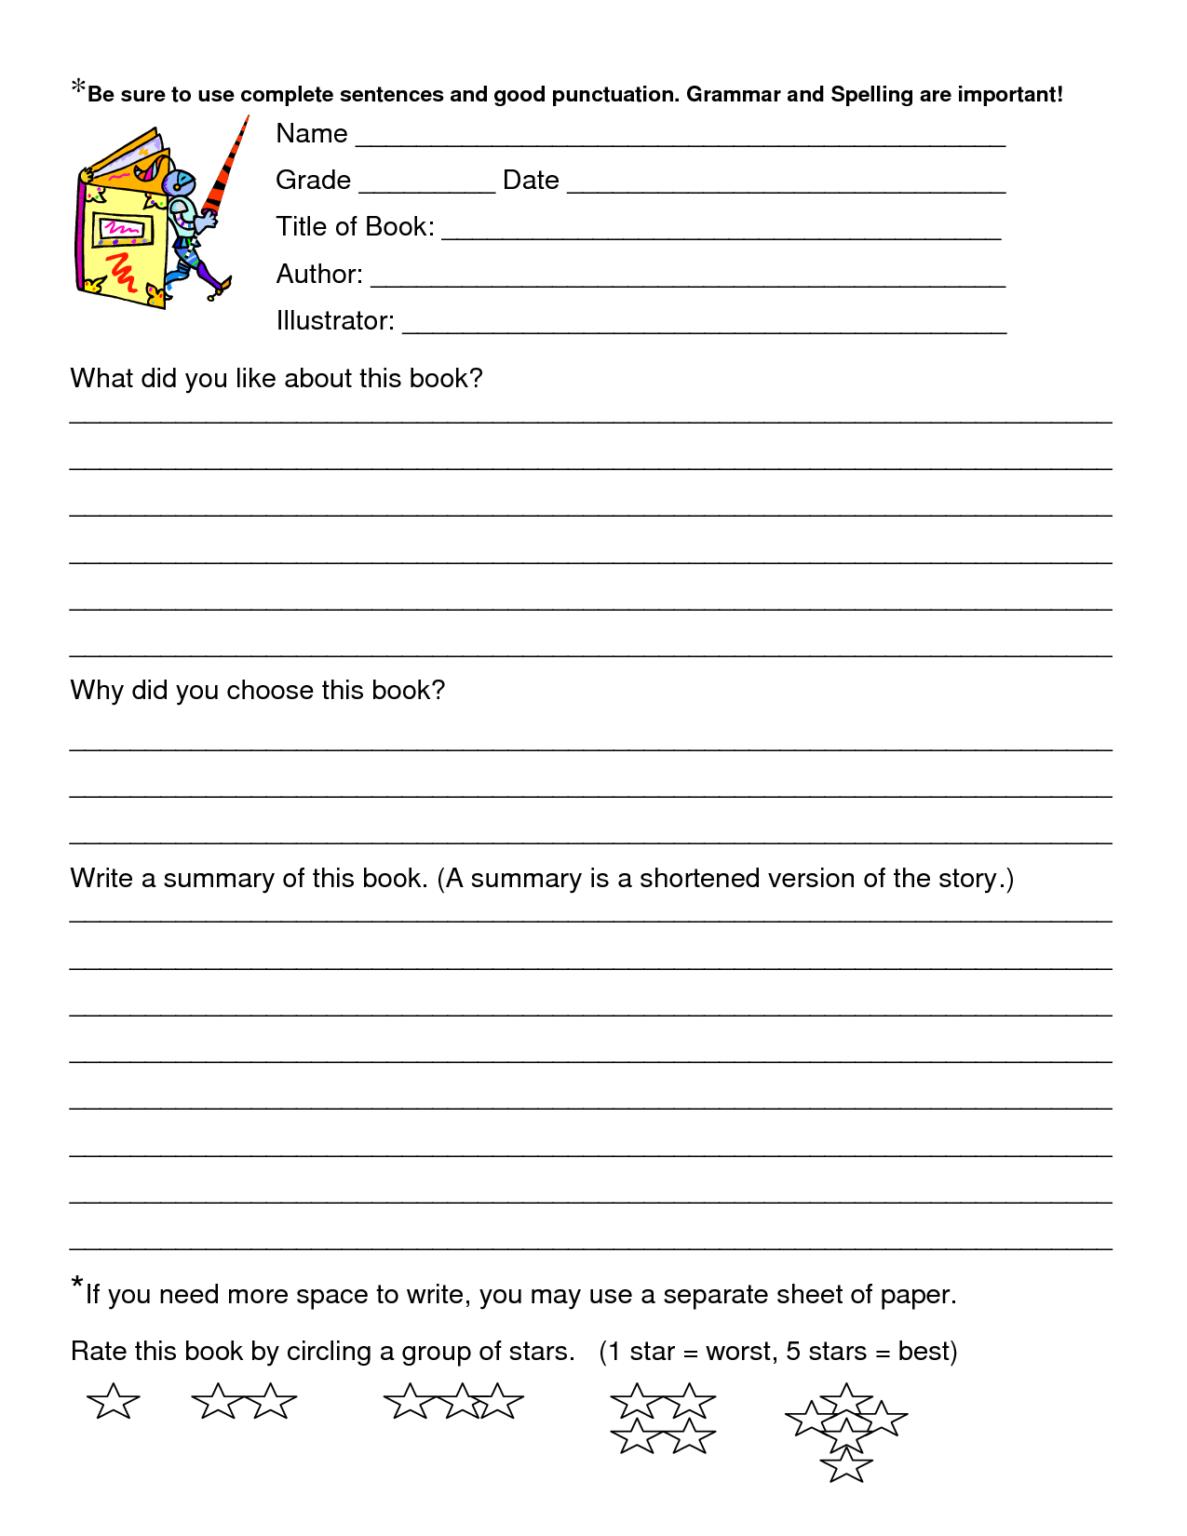 Book Review Worksheet Grade 5 | Printable Worksheets And ...